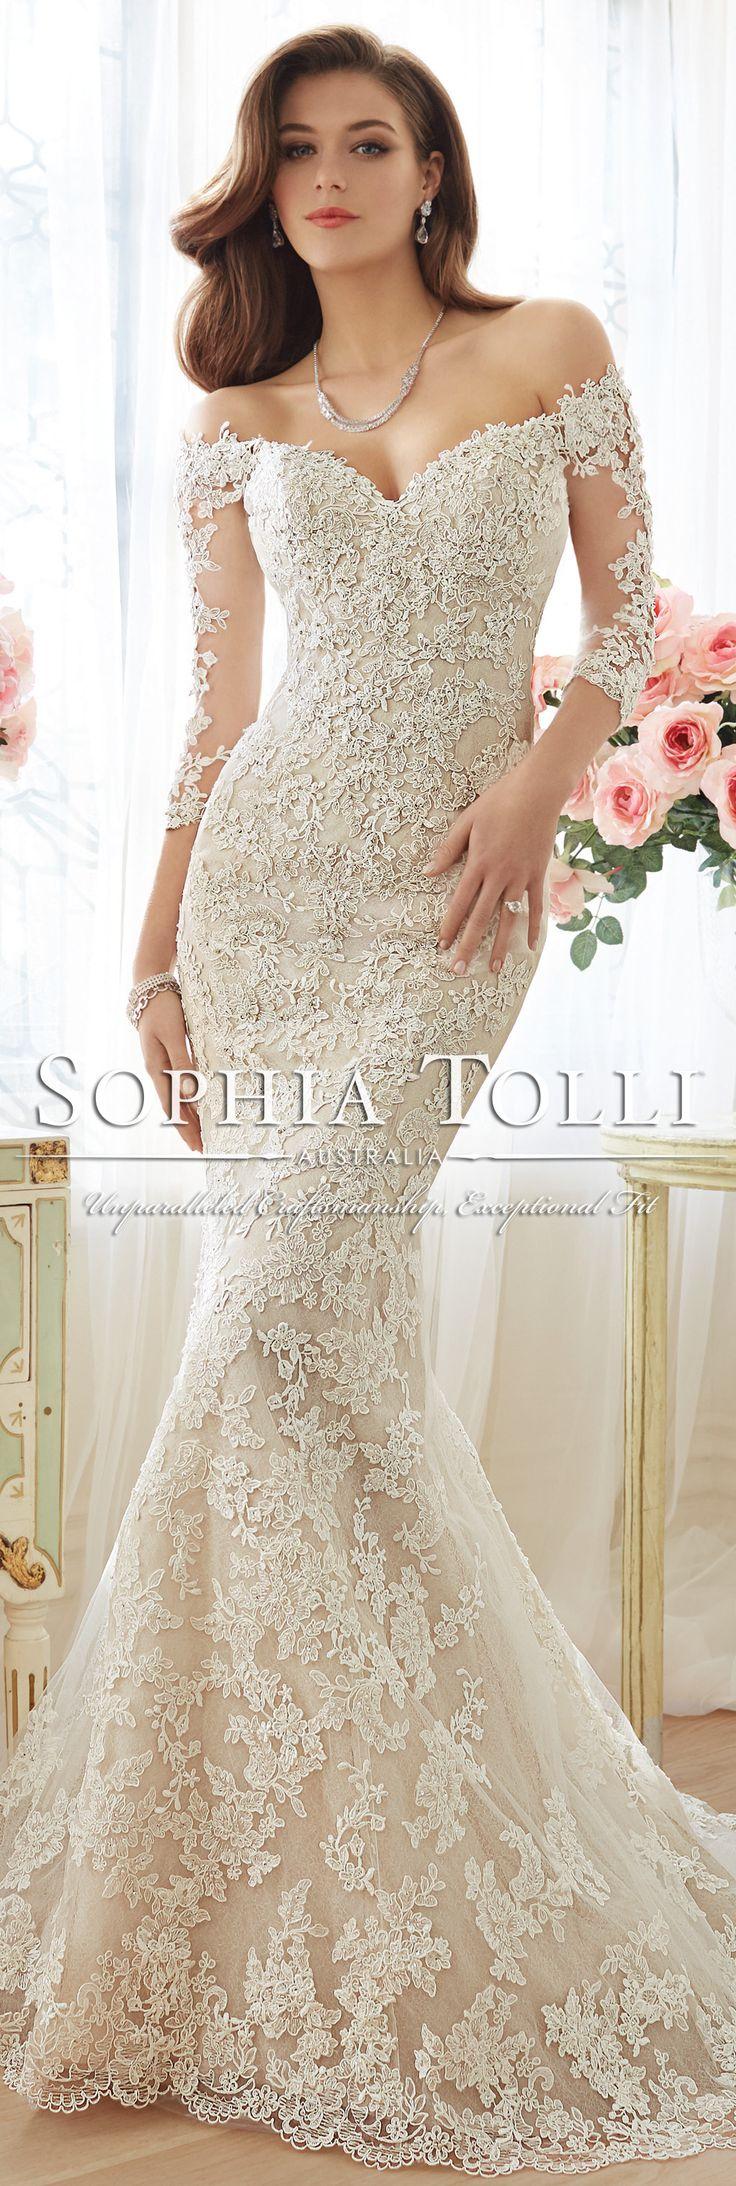 Styles of wedding dresses   best My Dream Wedding images on Pinterest  Short wedding gowns